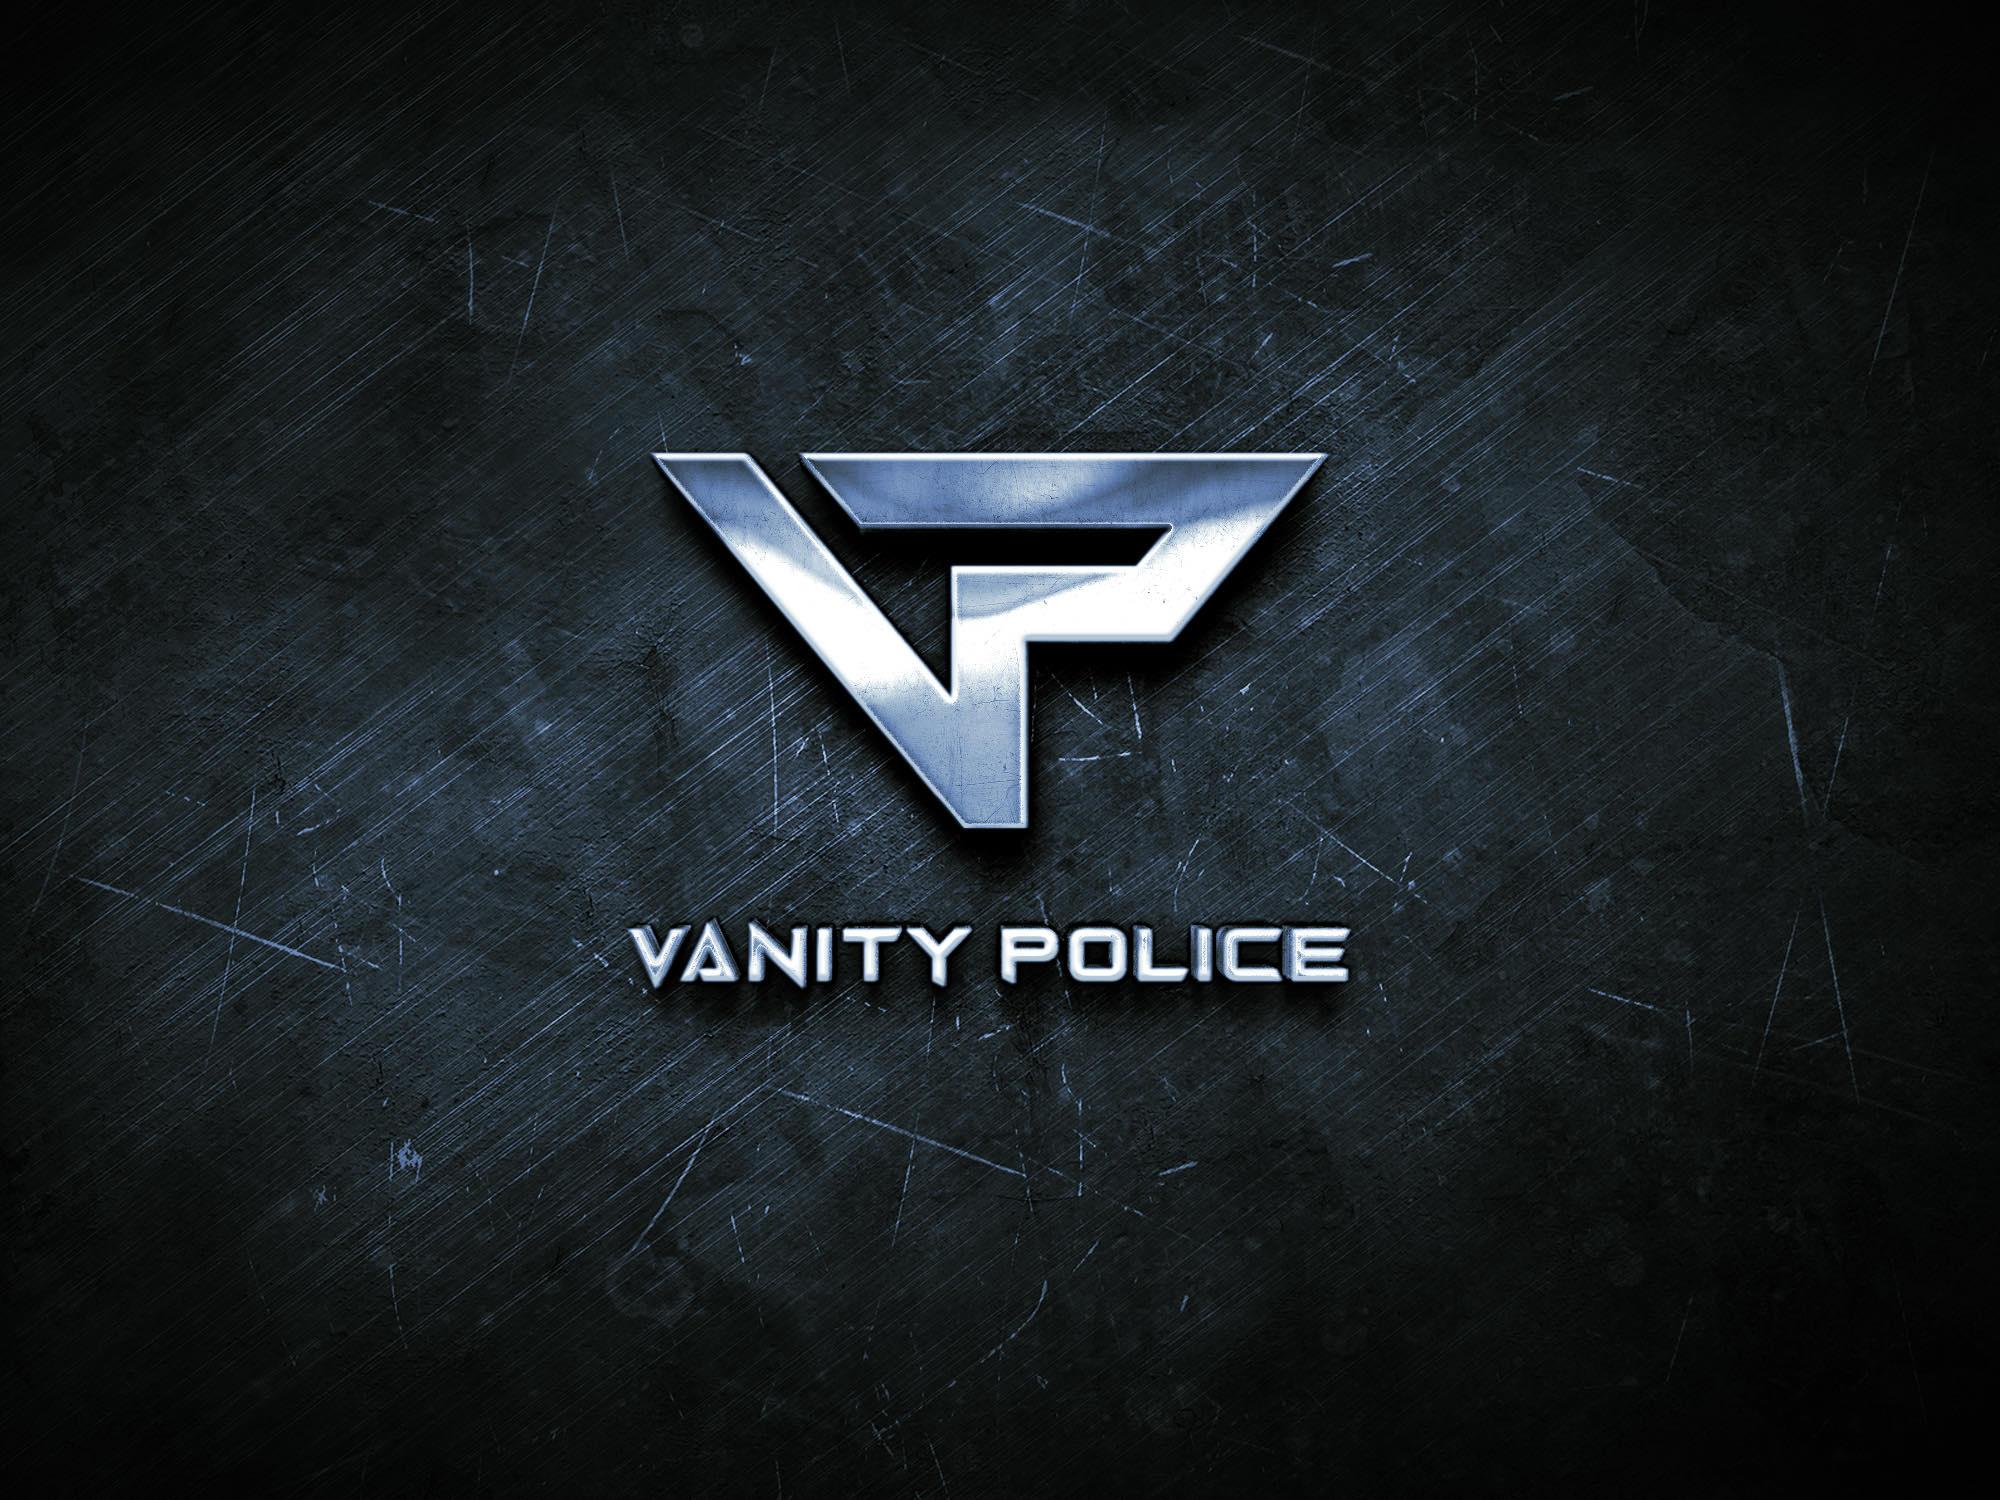 Vanity Police